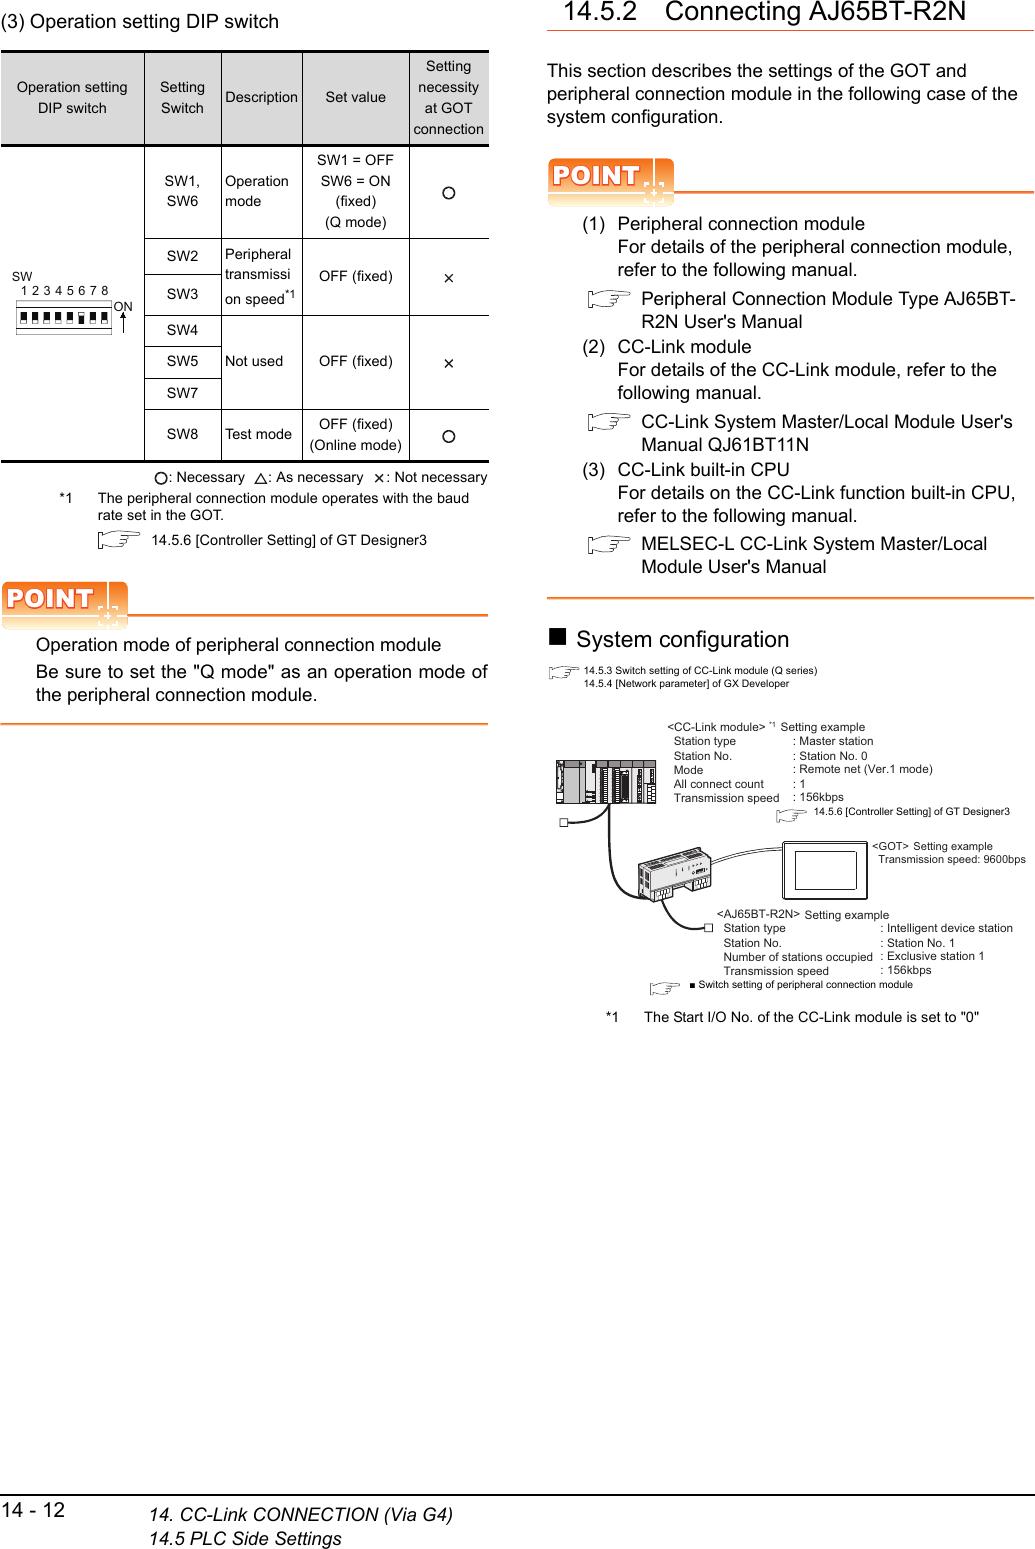 Mitsubishi Electronics Digital Portable Multimedia Player Got1000